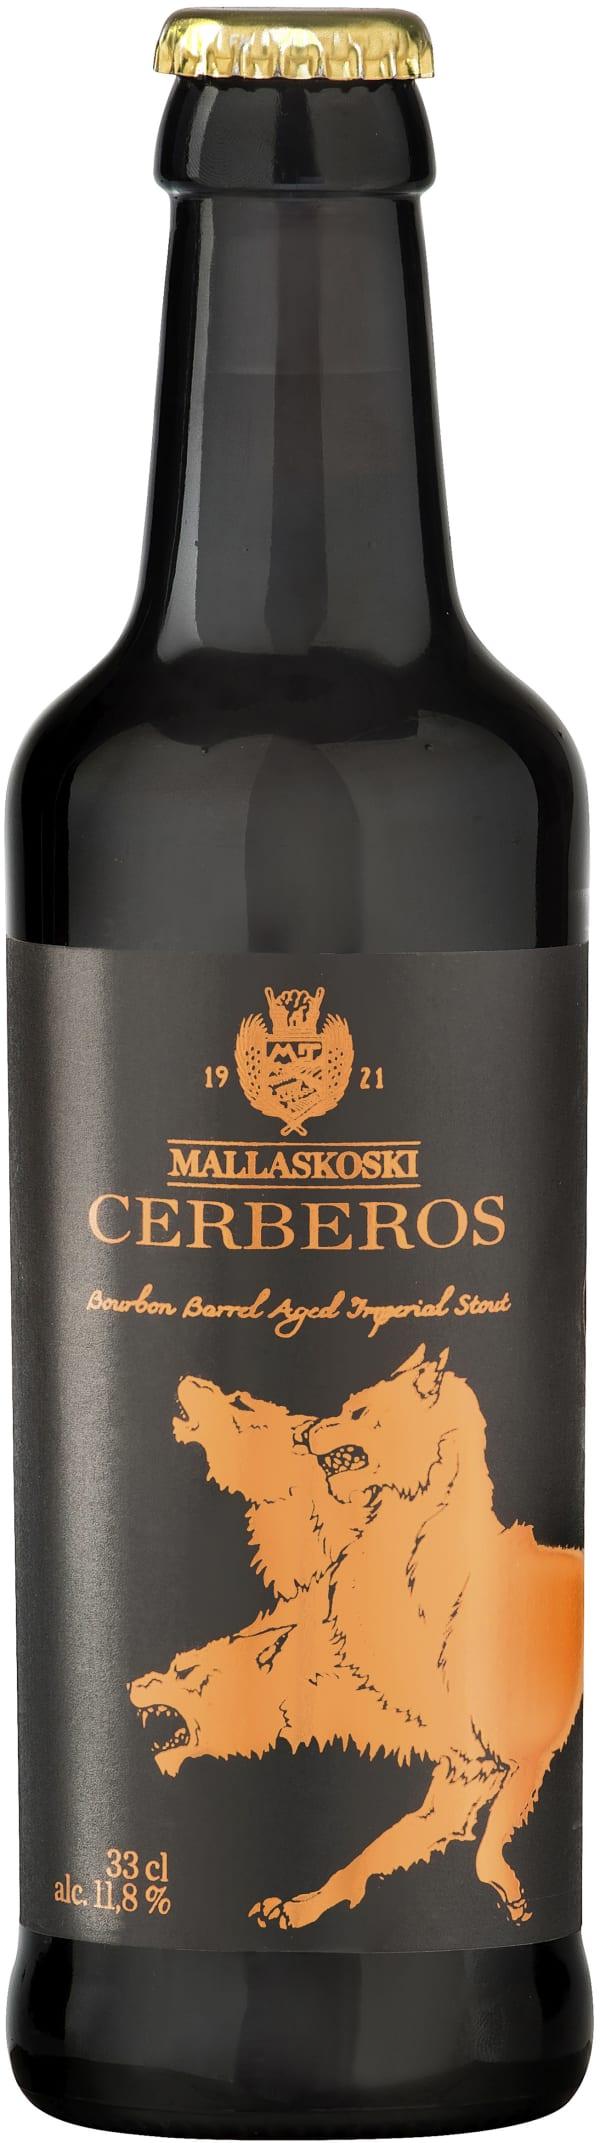 Mallaskoski Cerberos Bourbon Barrel Aged Imperial Stout